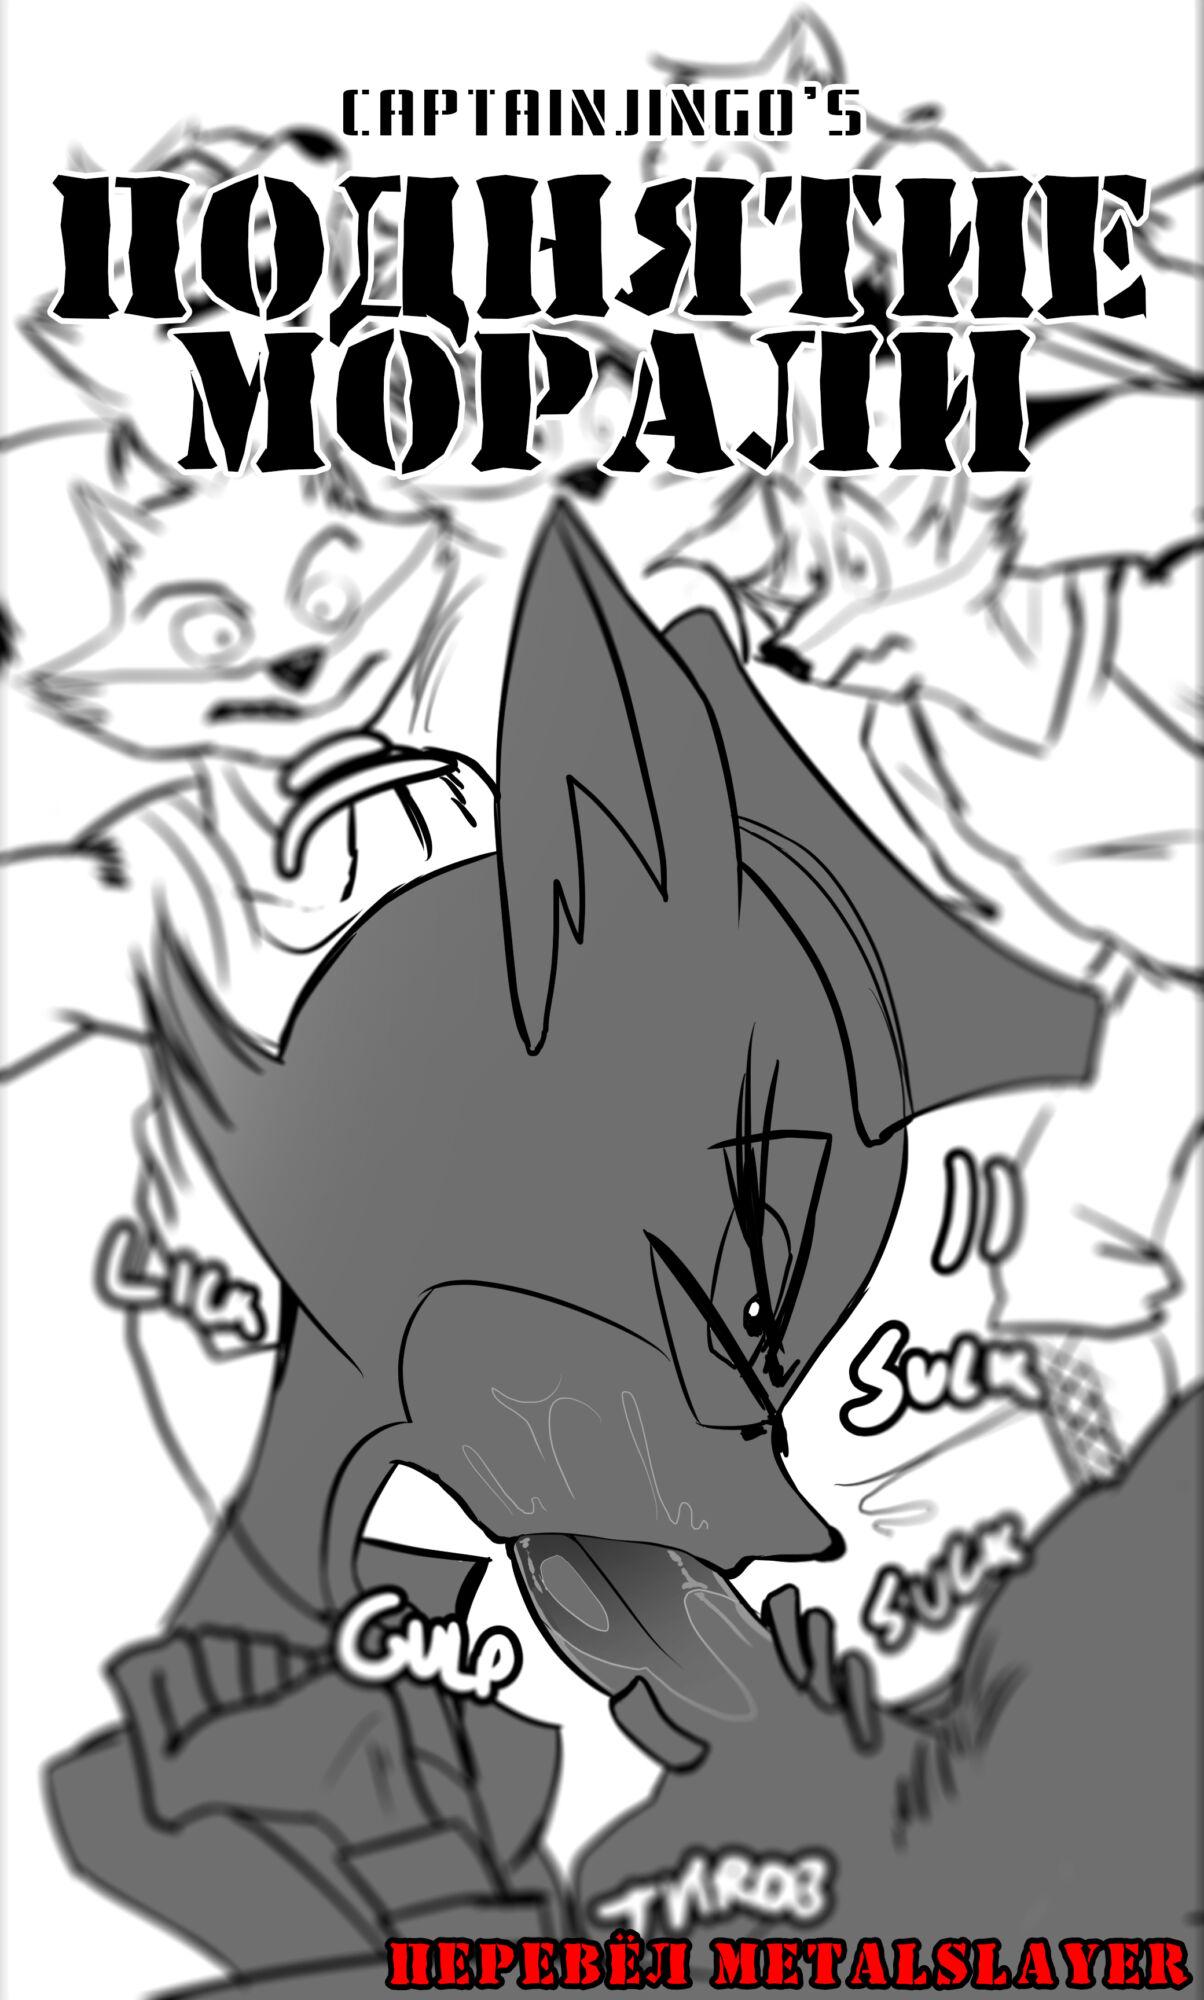 SureFap xxx porno Squirrel and Hedgehog - [Captainjingo] - Boosting Morale